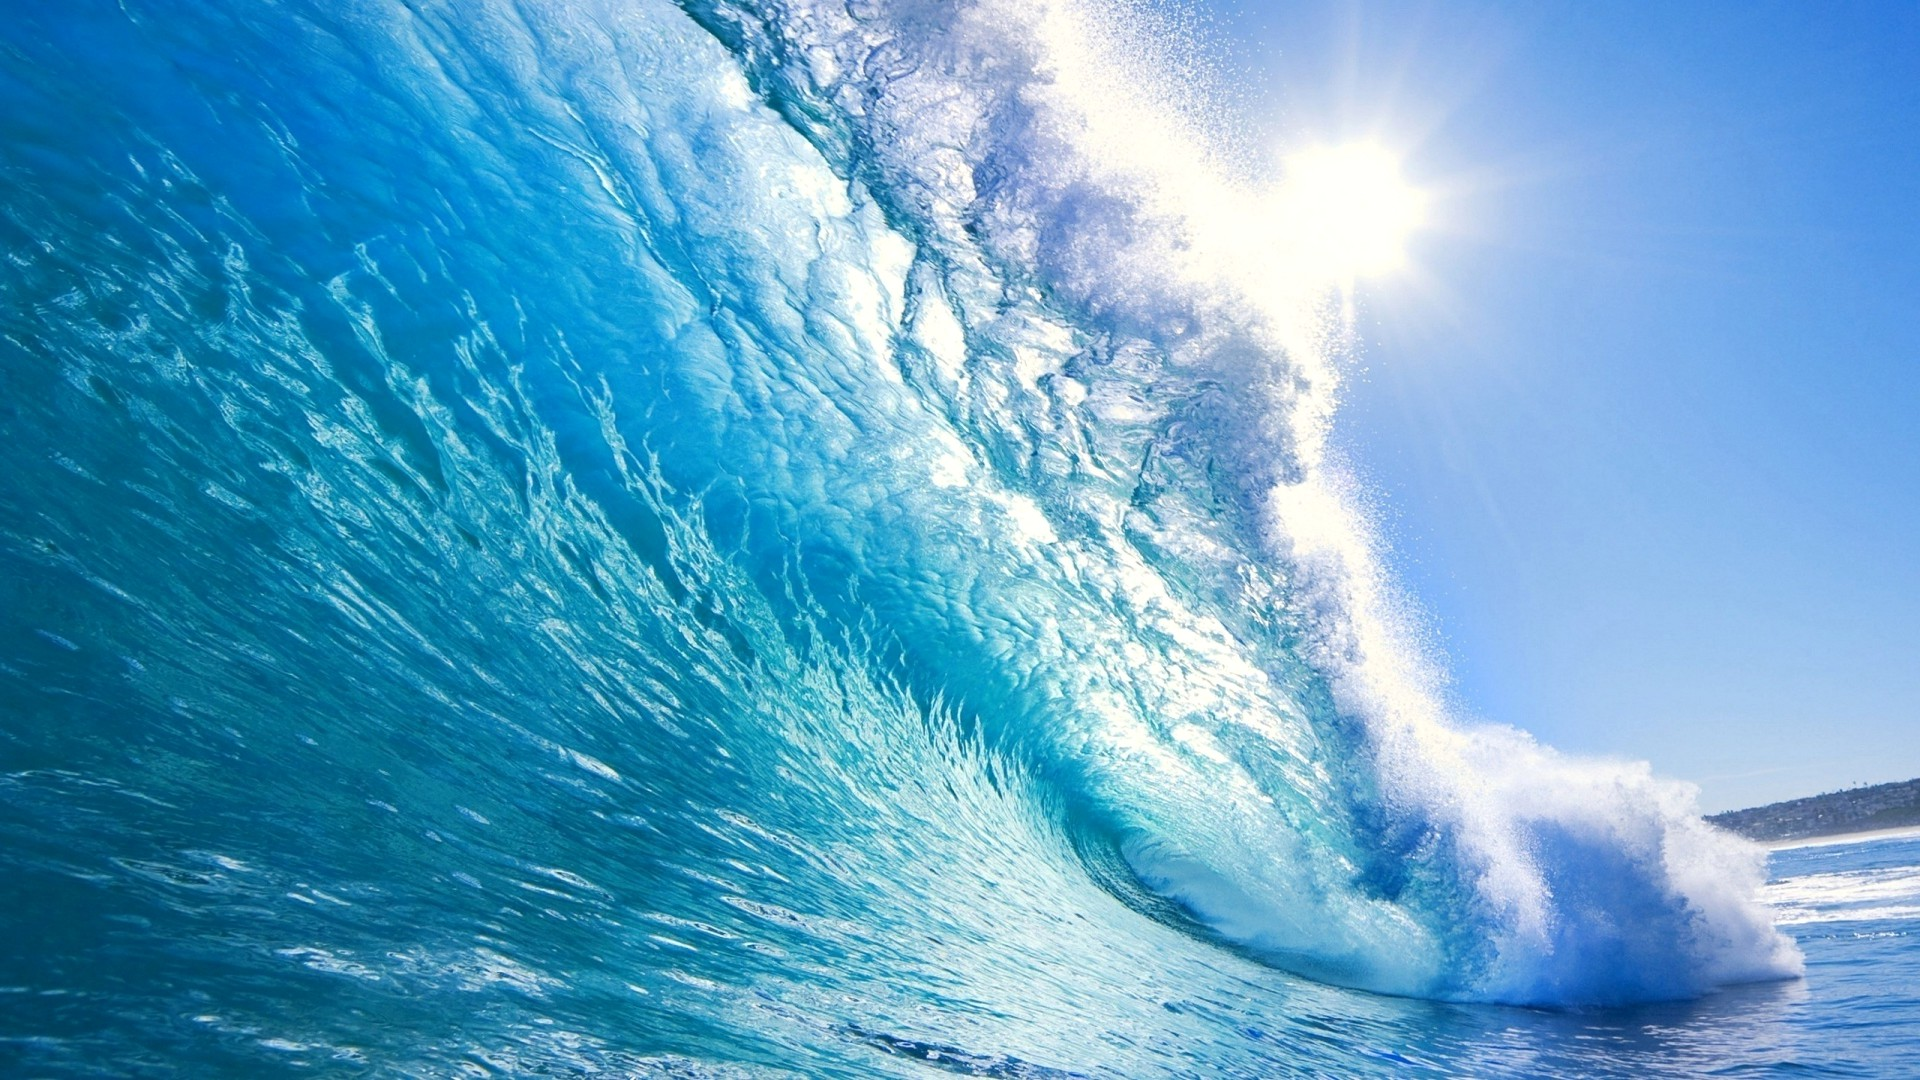 Beautiful Sea Wallpaper HD   Freetopwallpaper.com